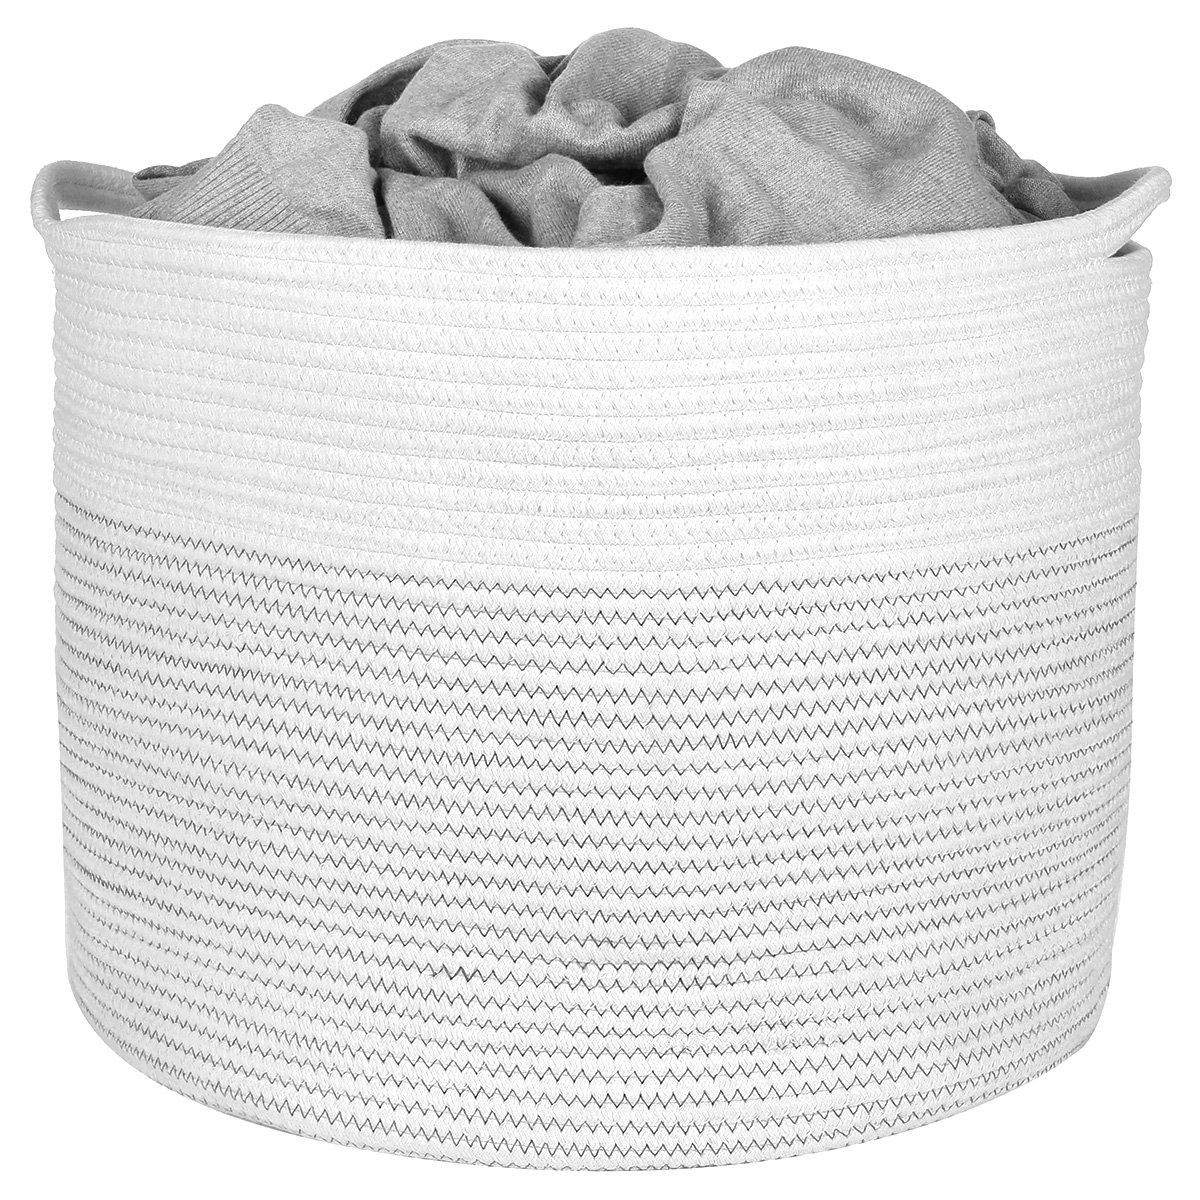 daaeecacbeab Amazon.com: Extra Large Storage Basket, Cotton Rope Storage Baskets, Woven  Laundry Hamper, Baby Toy Storage Bin, for Toys Towel Blanket Basket in  Living ...